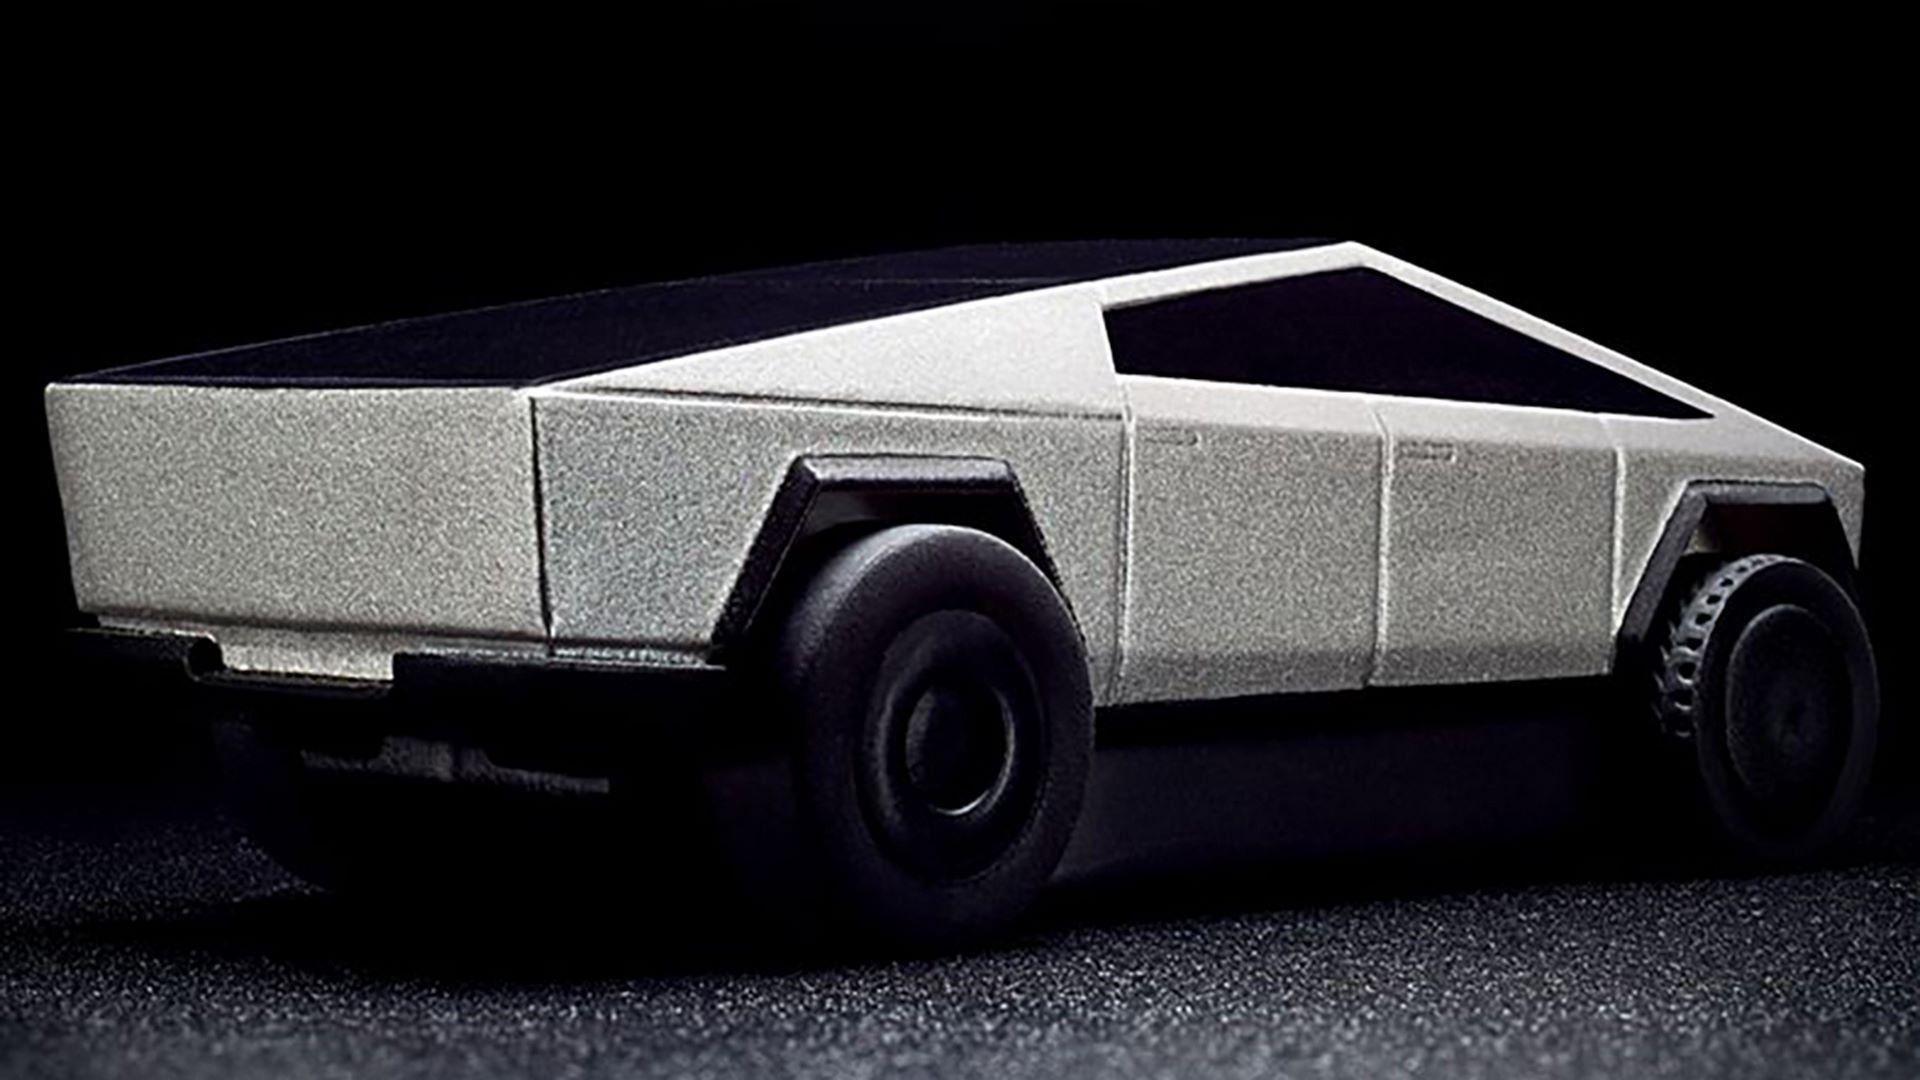 Hot-Wheels-RC-Tesla-Cybertruck-8